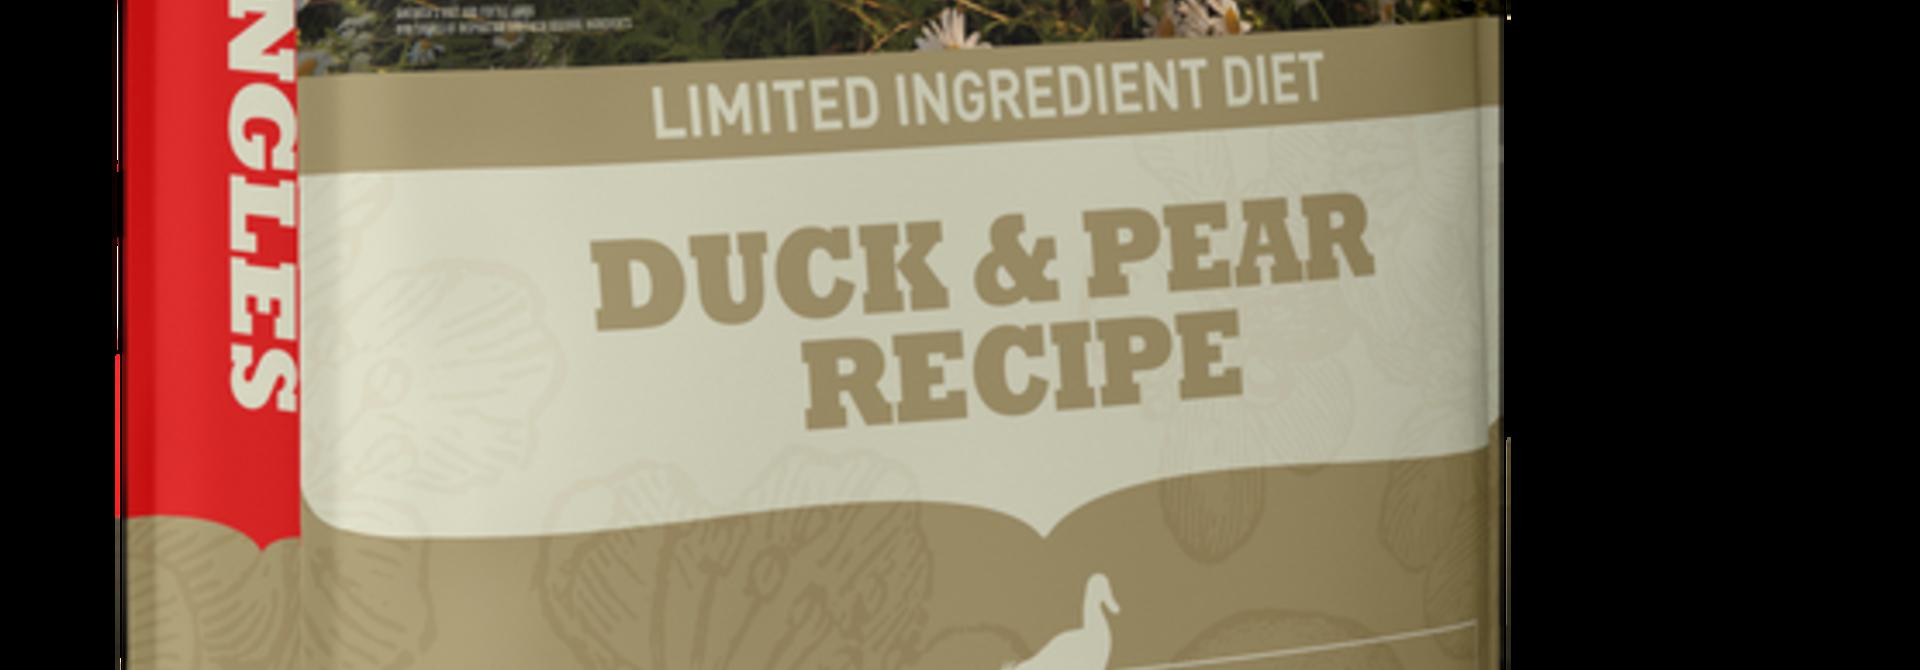 ACS Free Run Duck